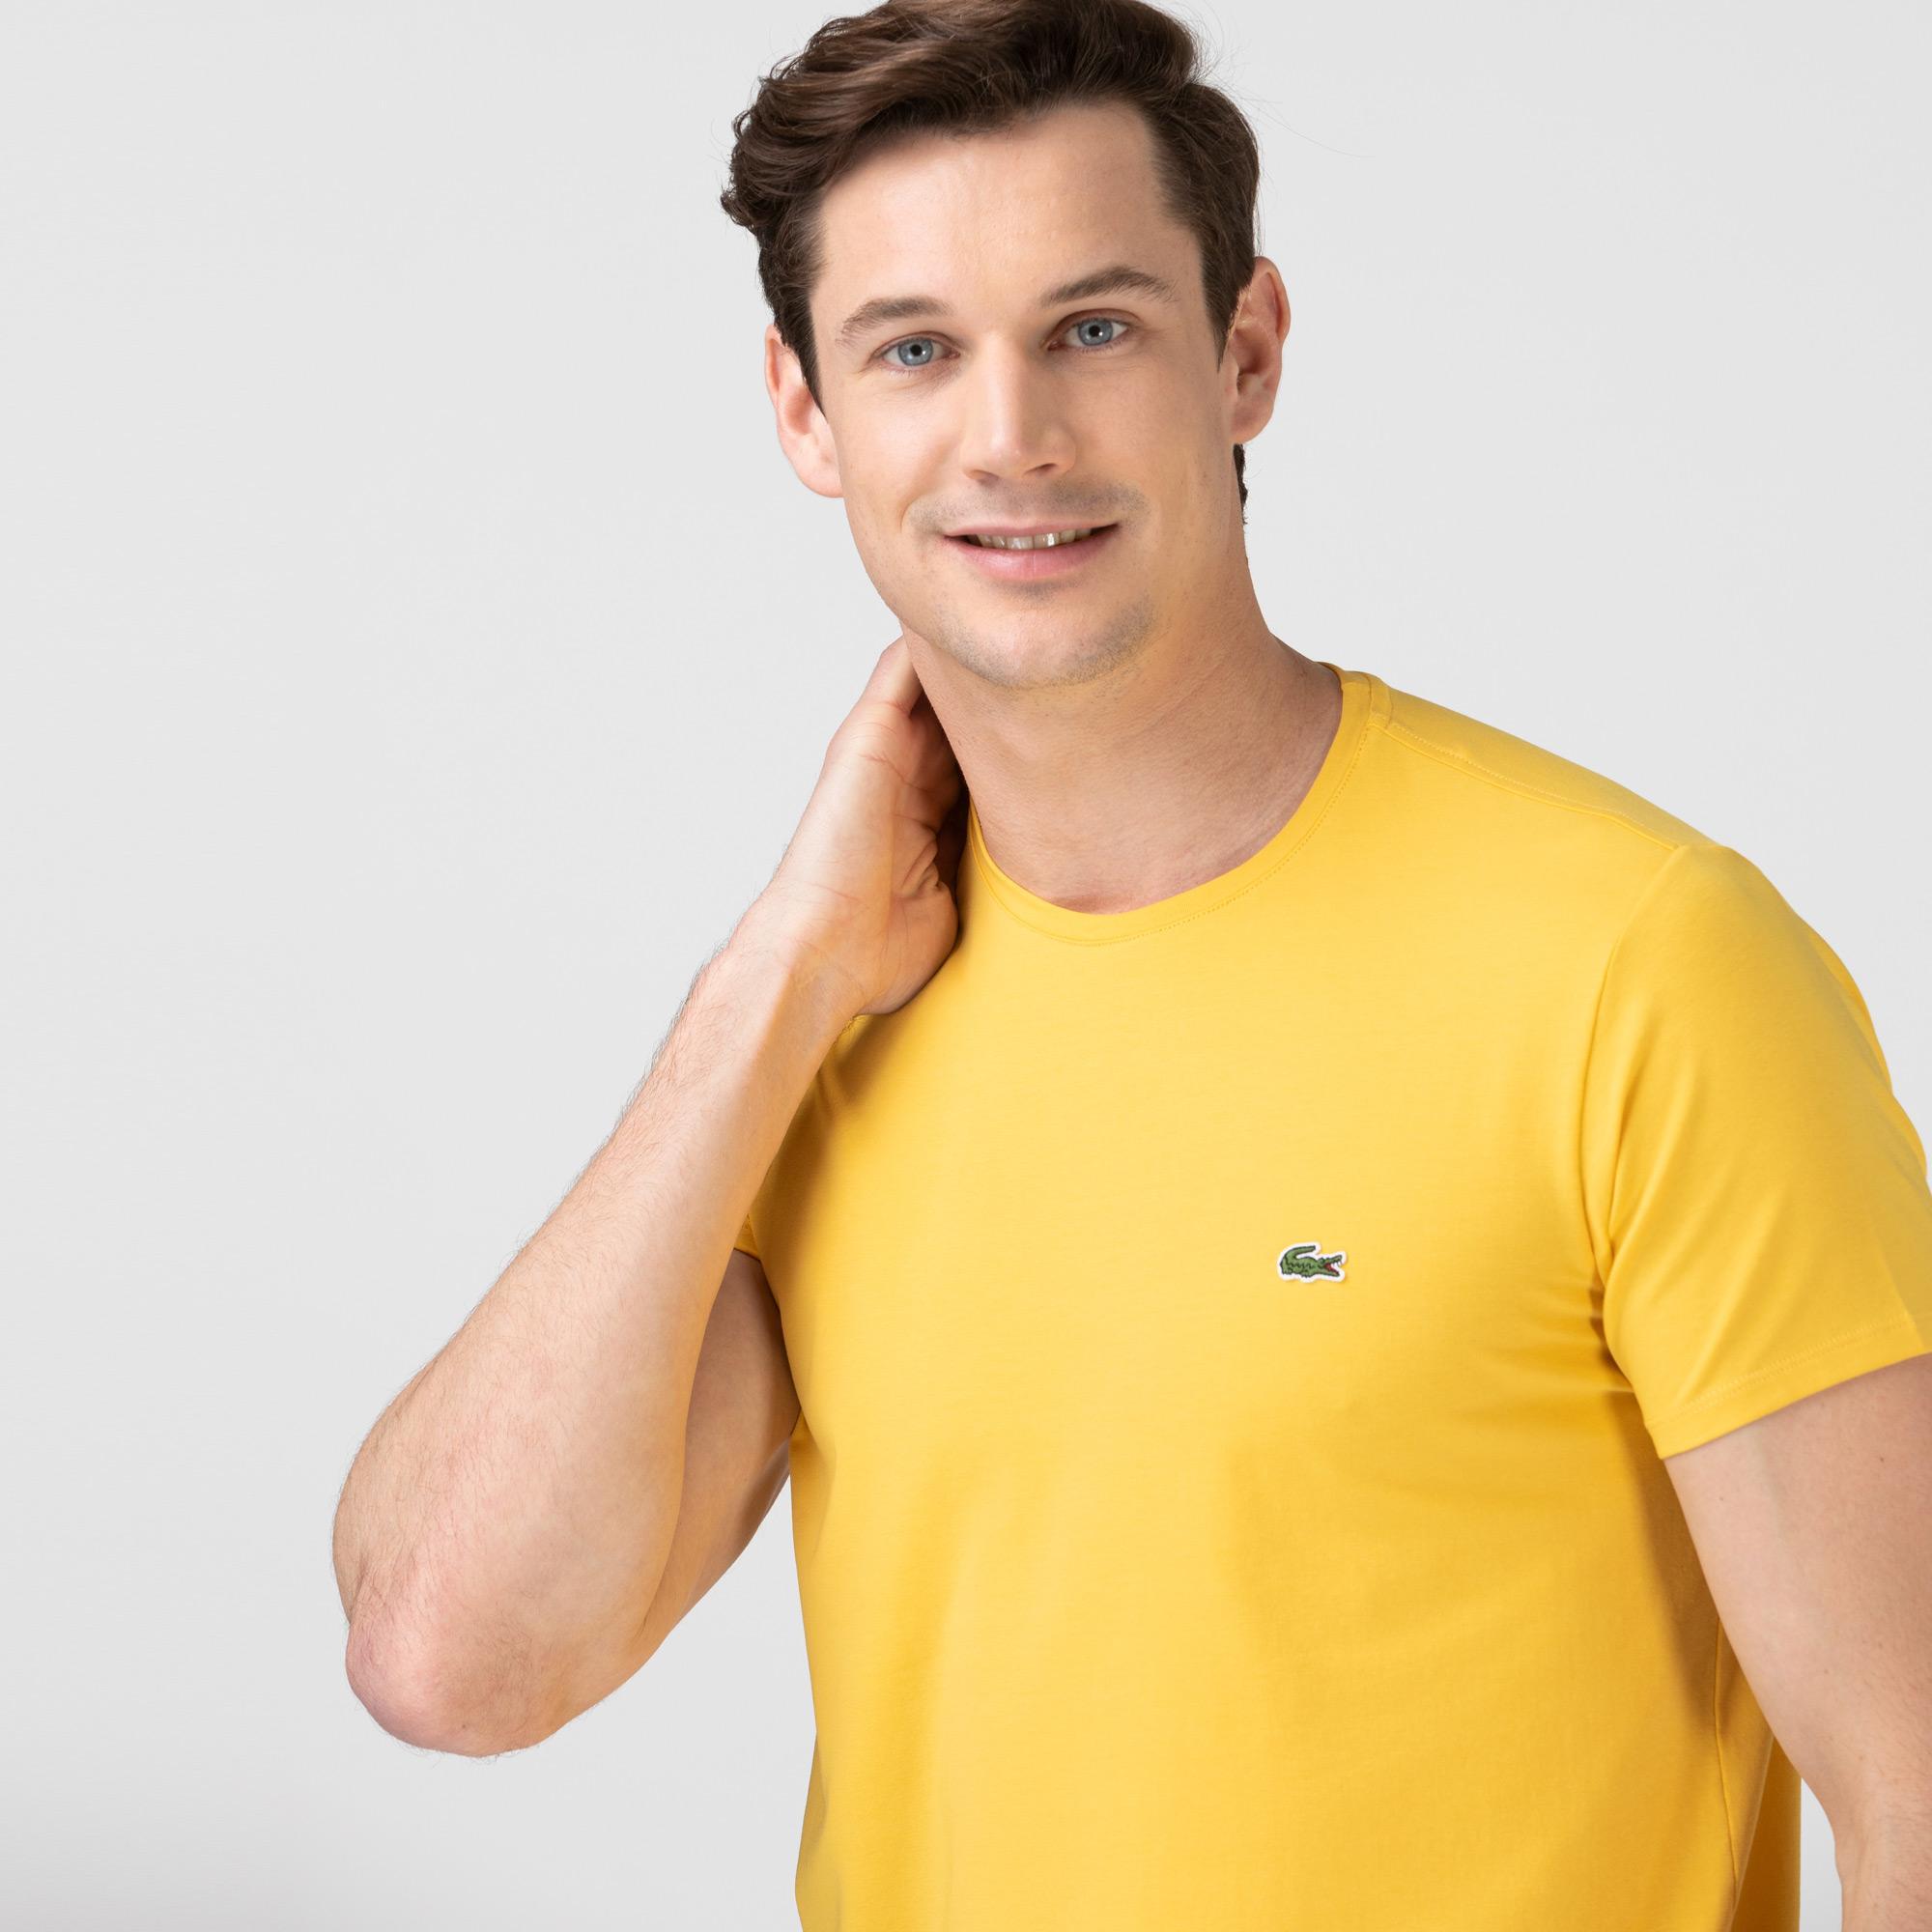 Lacoste Erkek Slim Fit Bisiklet Yaka Sarı T-Shirt